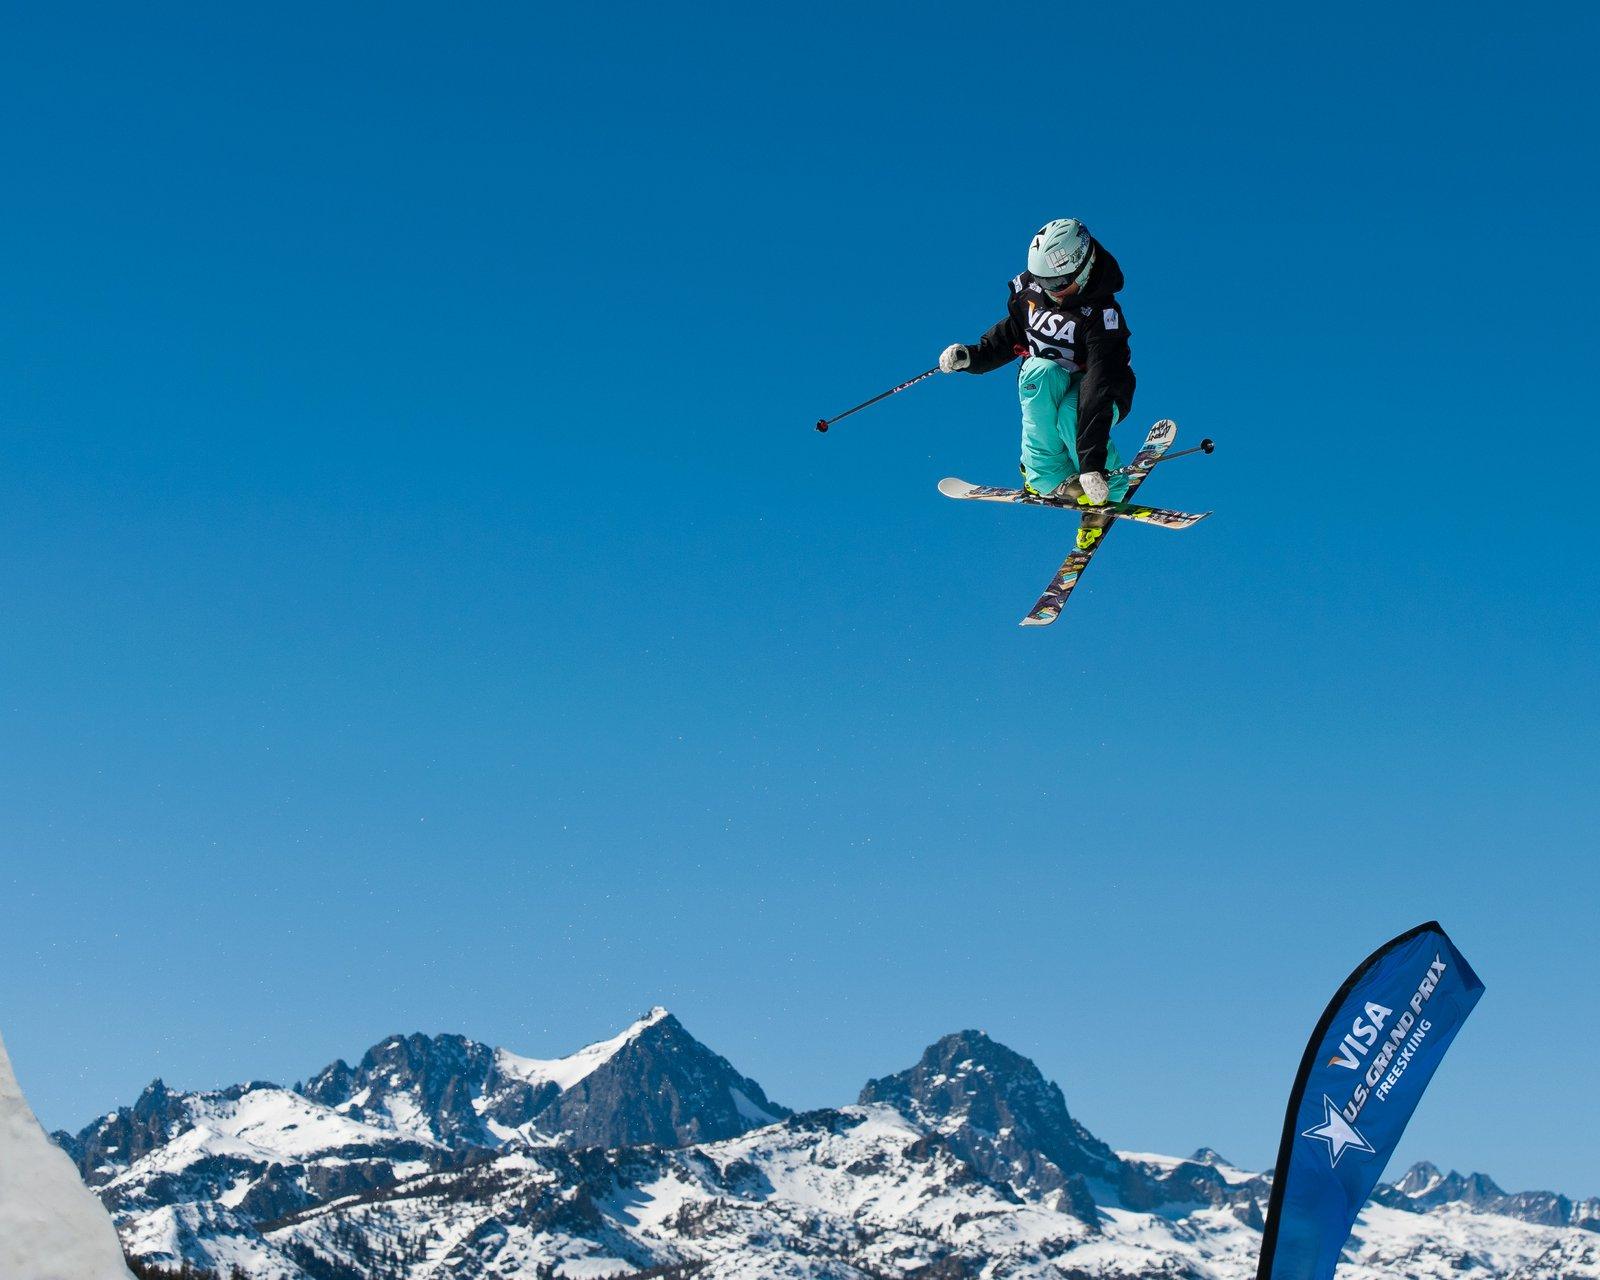 US Freeskiing Grand Prix - Women's Slopestyle